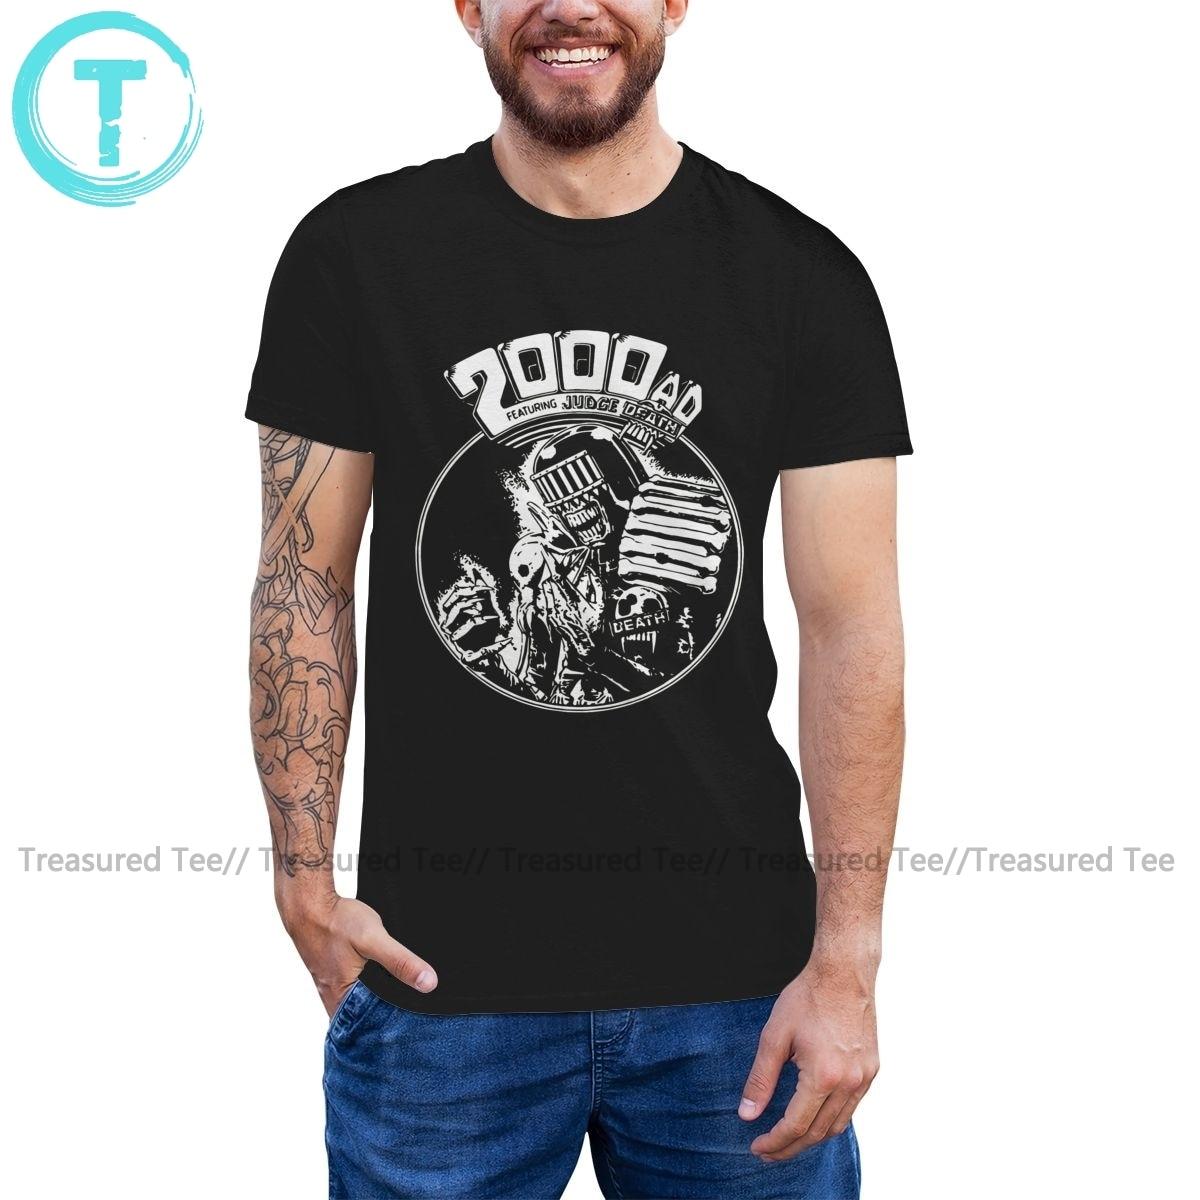 Camiseta Judge Dredd, camiseta de manga corta con estampado de la muerte de Dredd, camiseta divertida para hombre